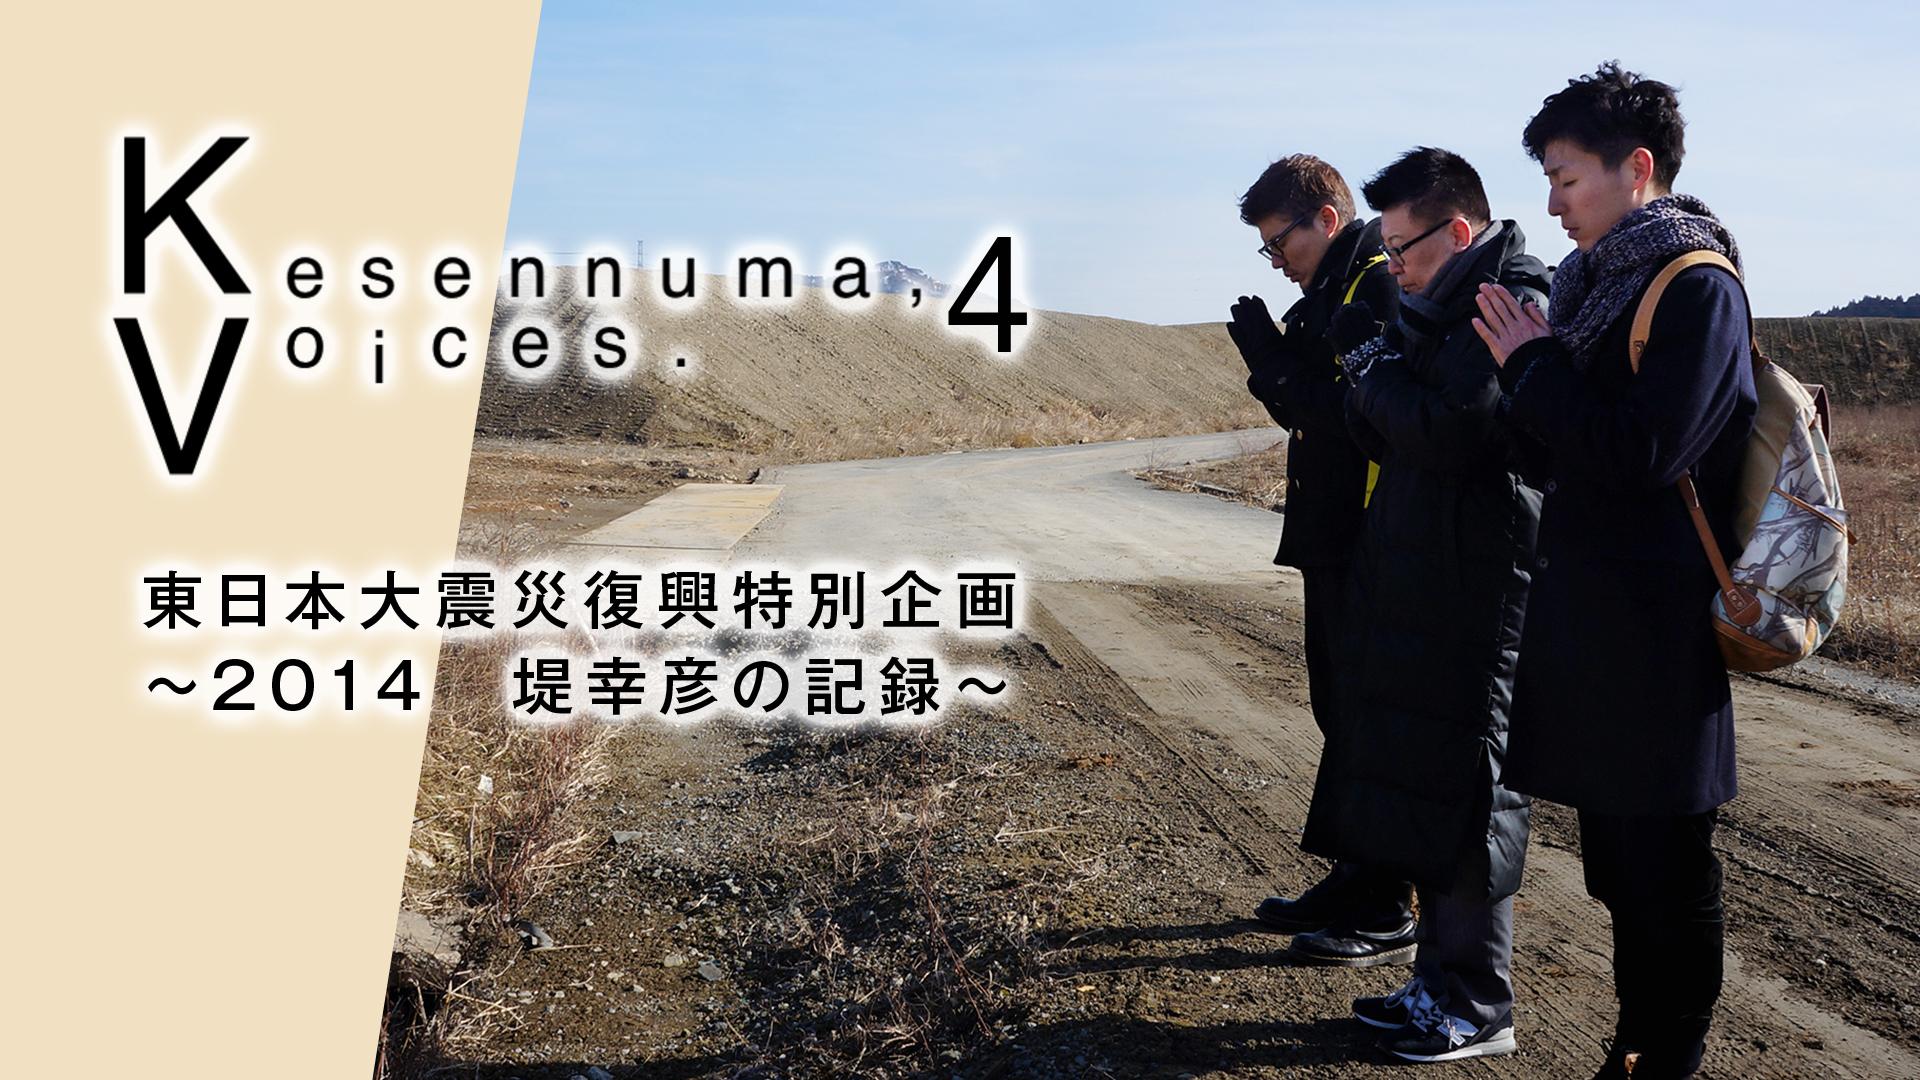 Kesennuma,Voices.4 東日本大震災復興特別企画~2014 堤幸彦の記録~の動画 - Kesennuma,Voices.7 東日本大震災復興特別企画~2017 堤幸彦の記録~